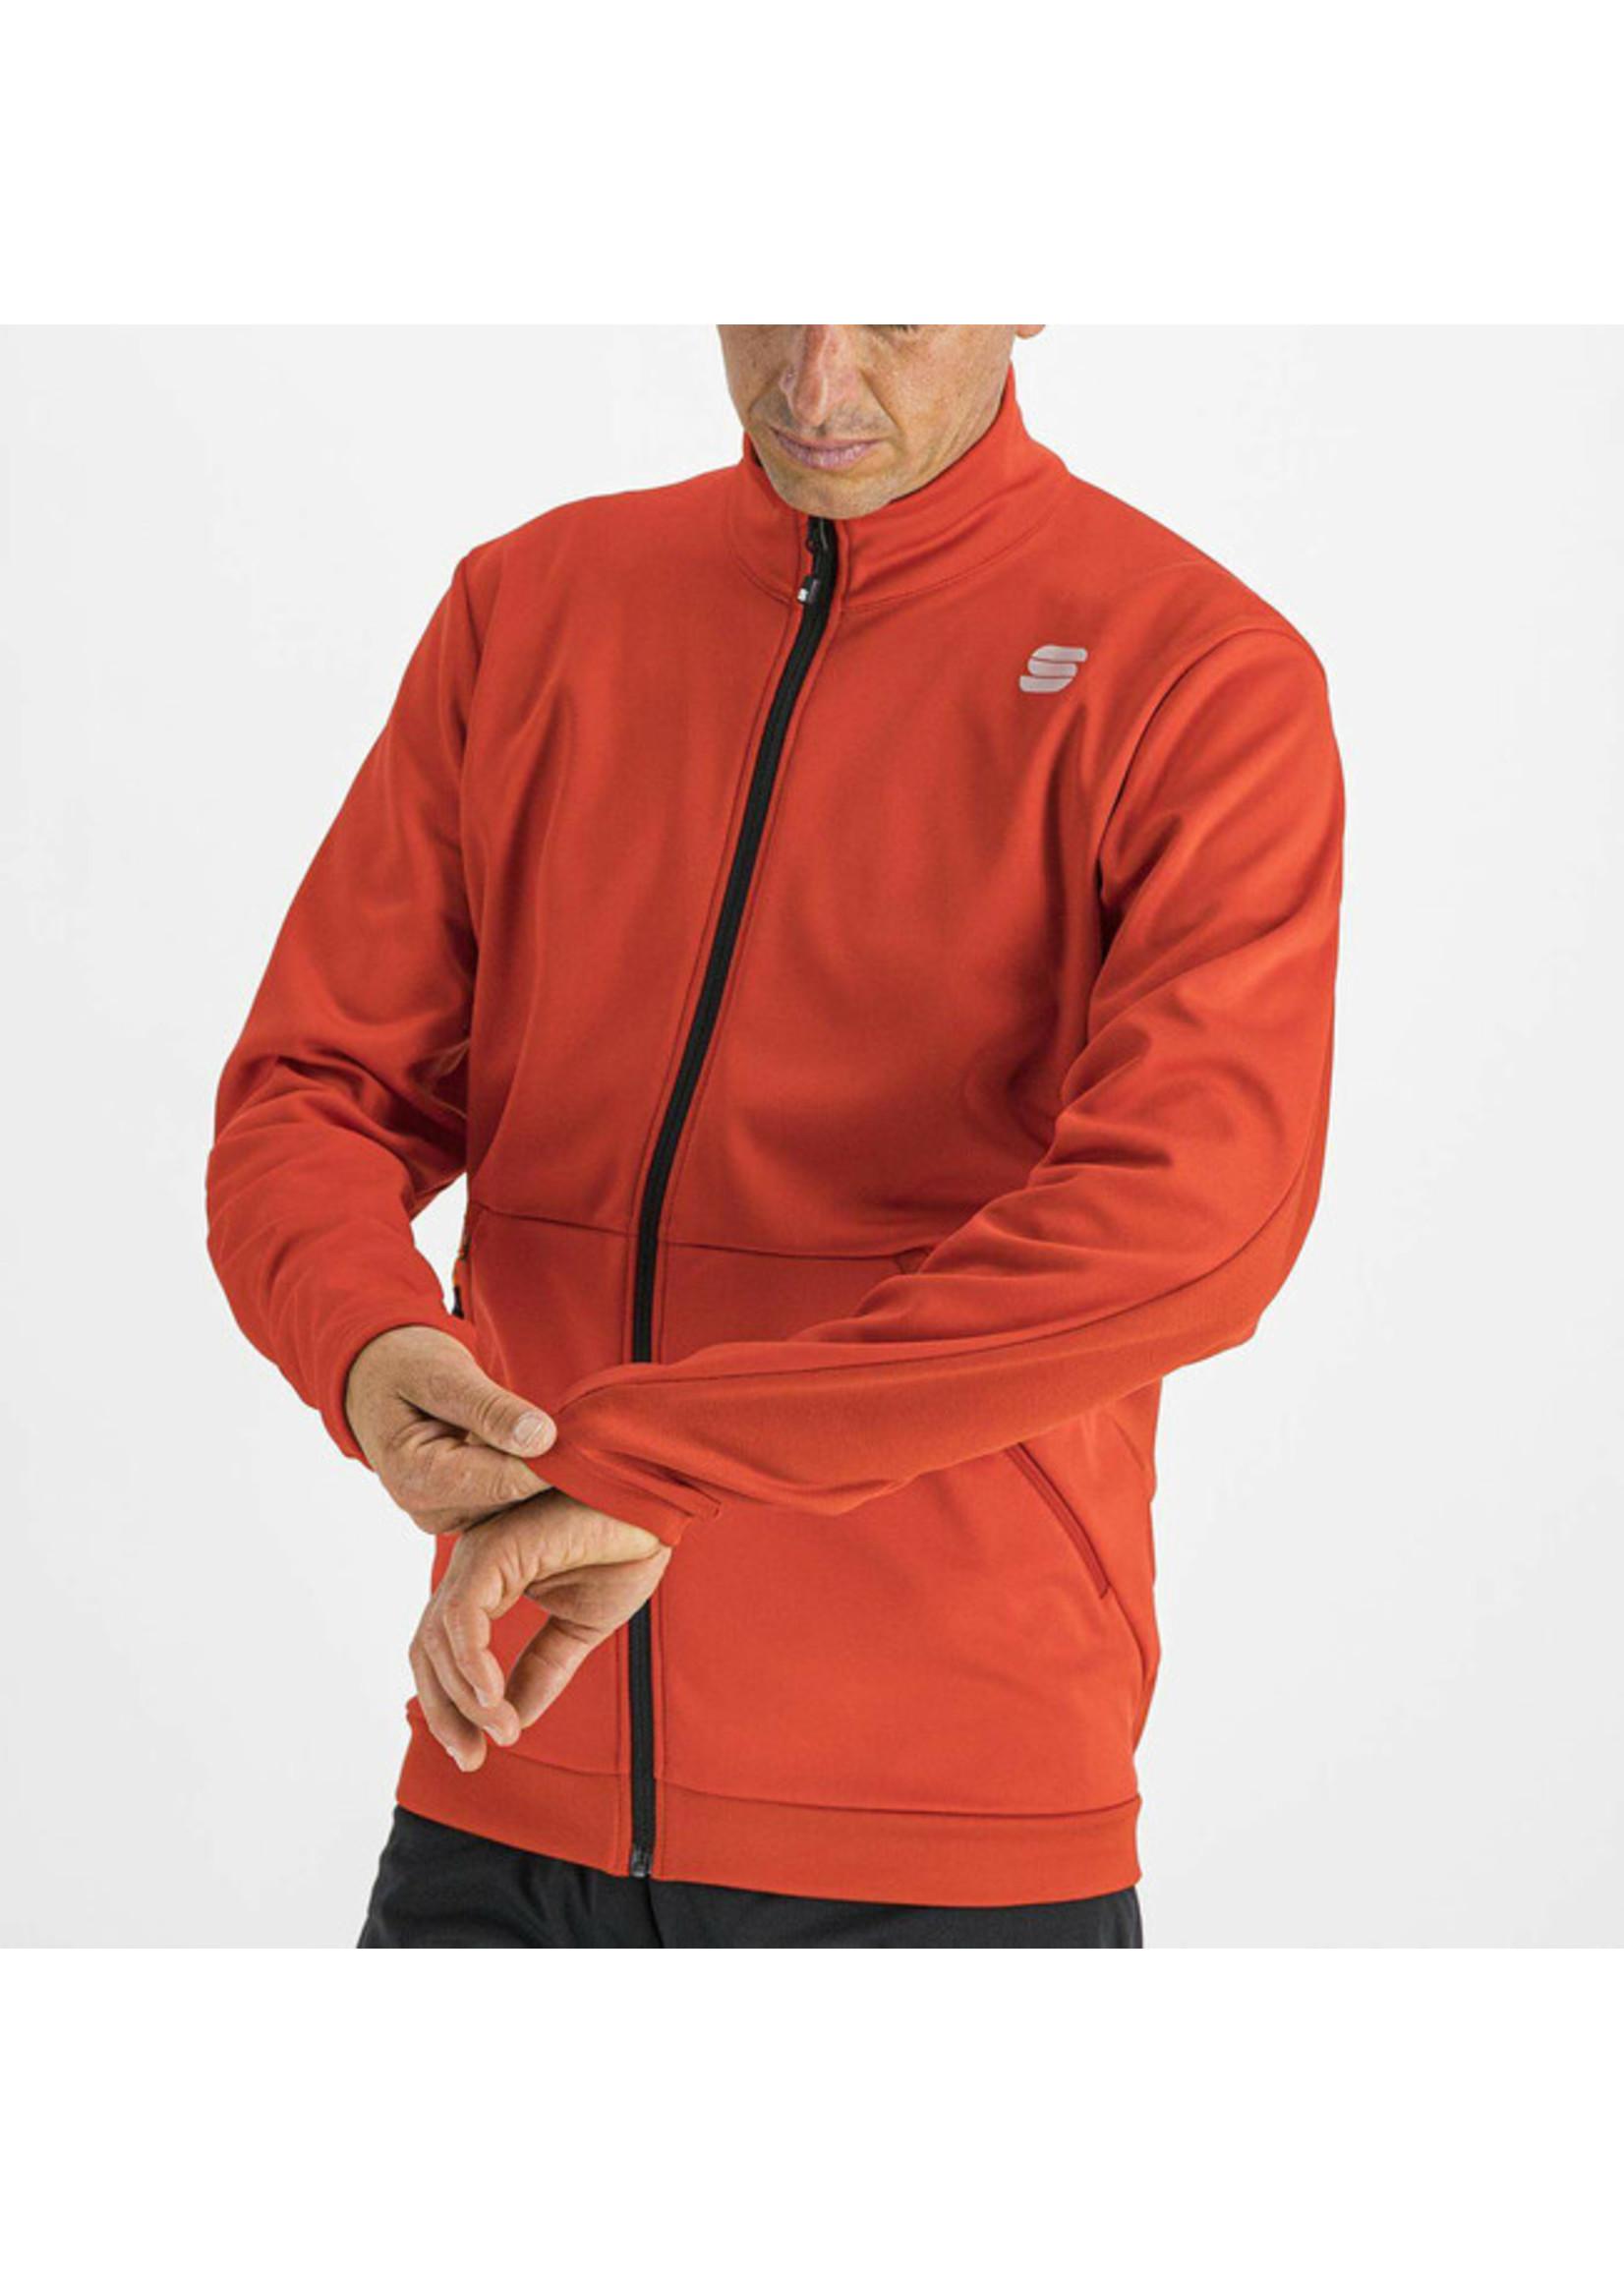 Sportful Sportful- Engadin Wind Jacket